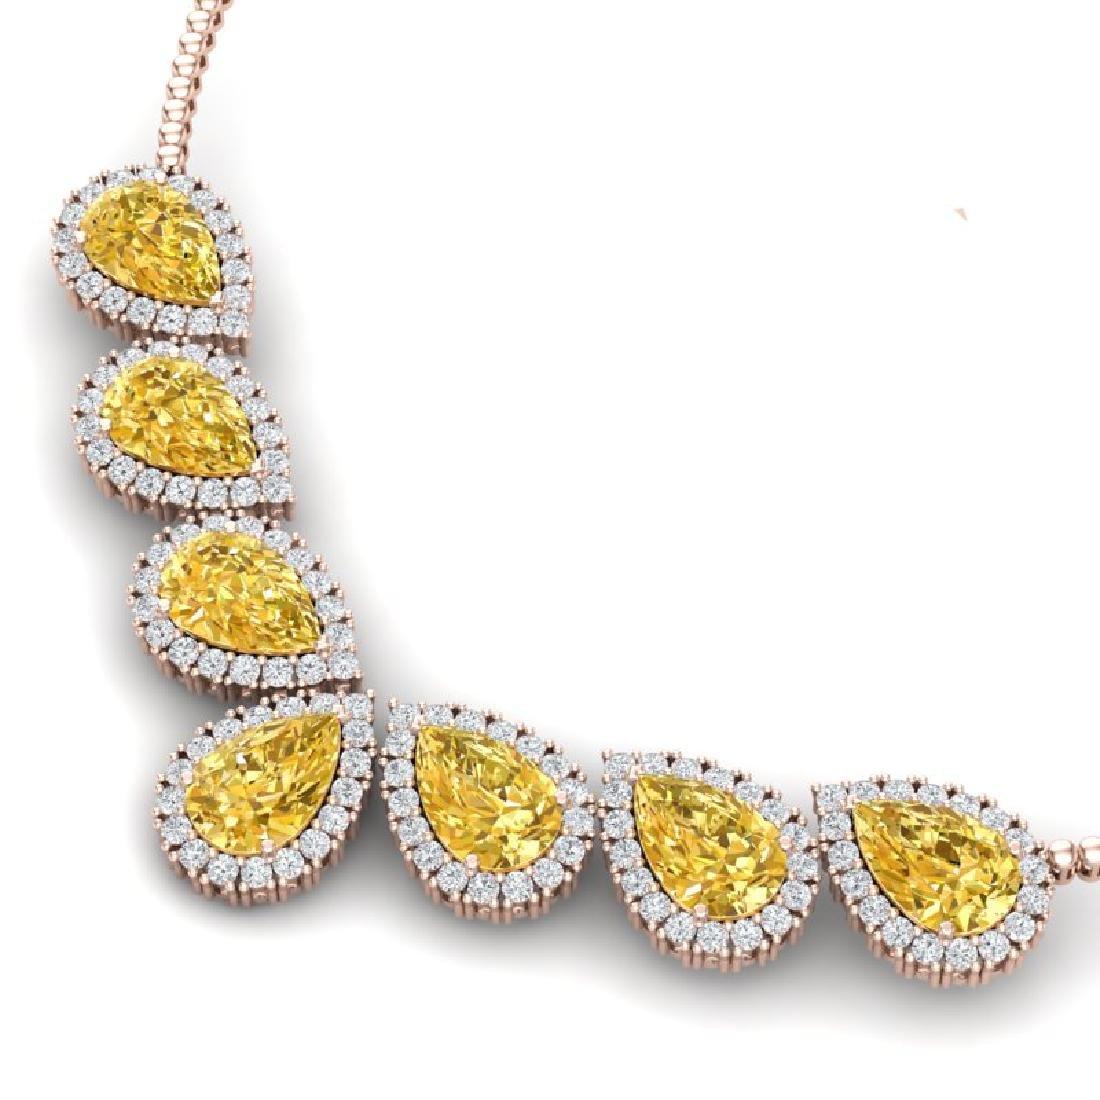 33.34 CTW Royalty Canary Citrine & VS Diamond Necklace - 2